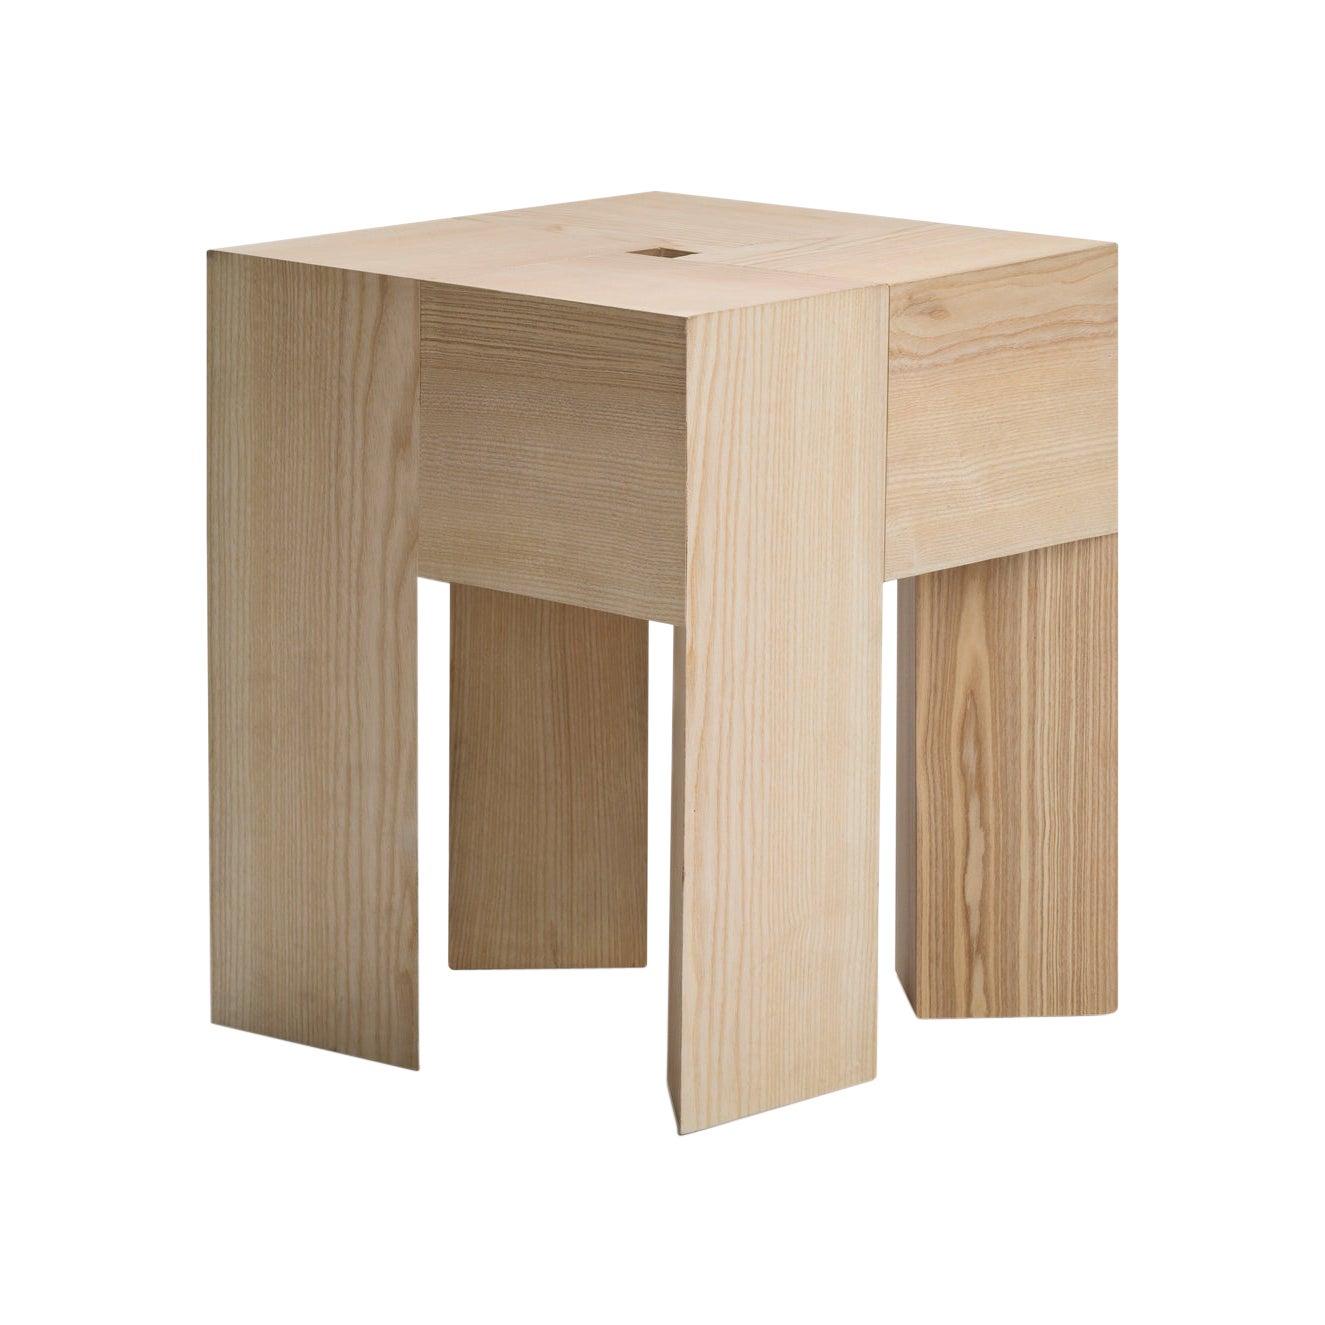 Aldo Bakker 'Triangle' Wood Stool or Side Table